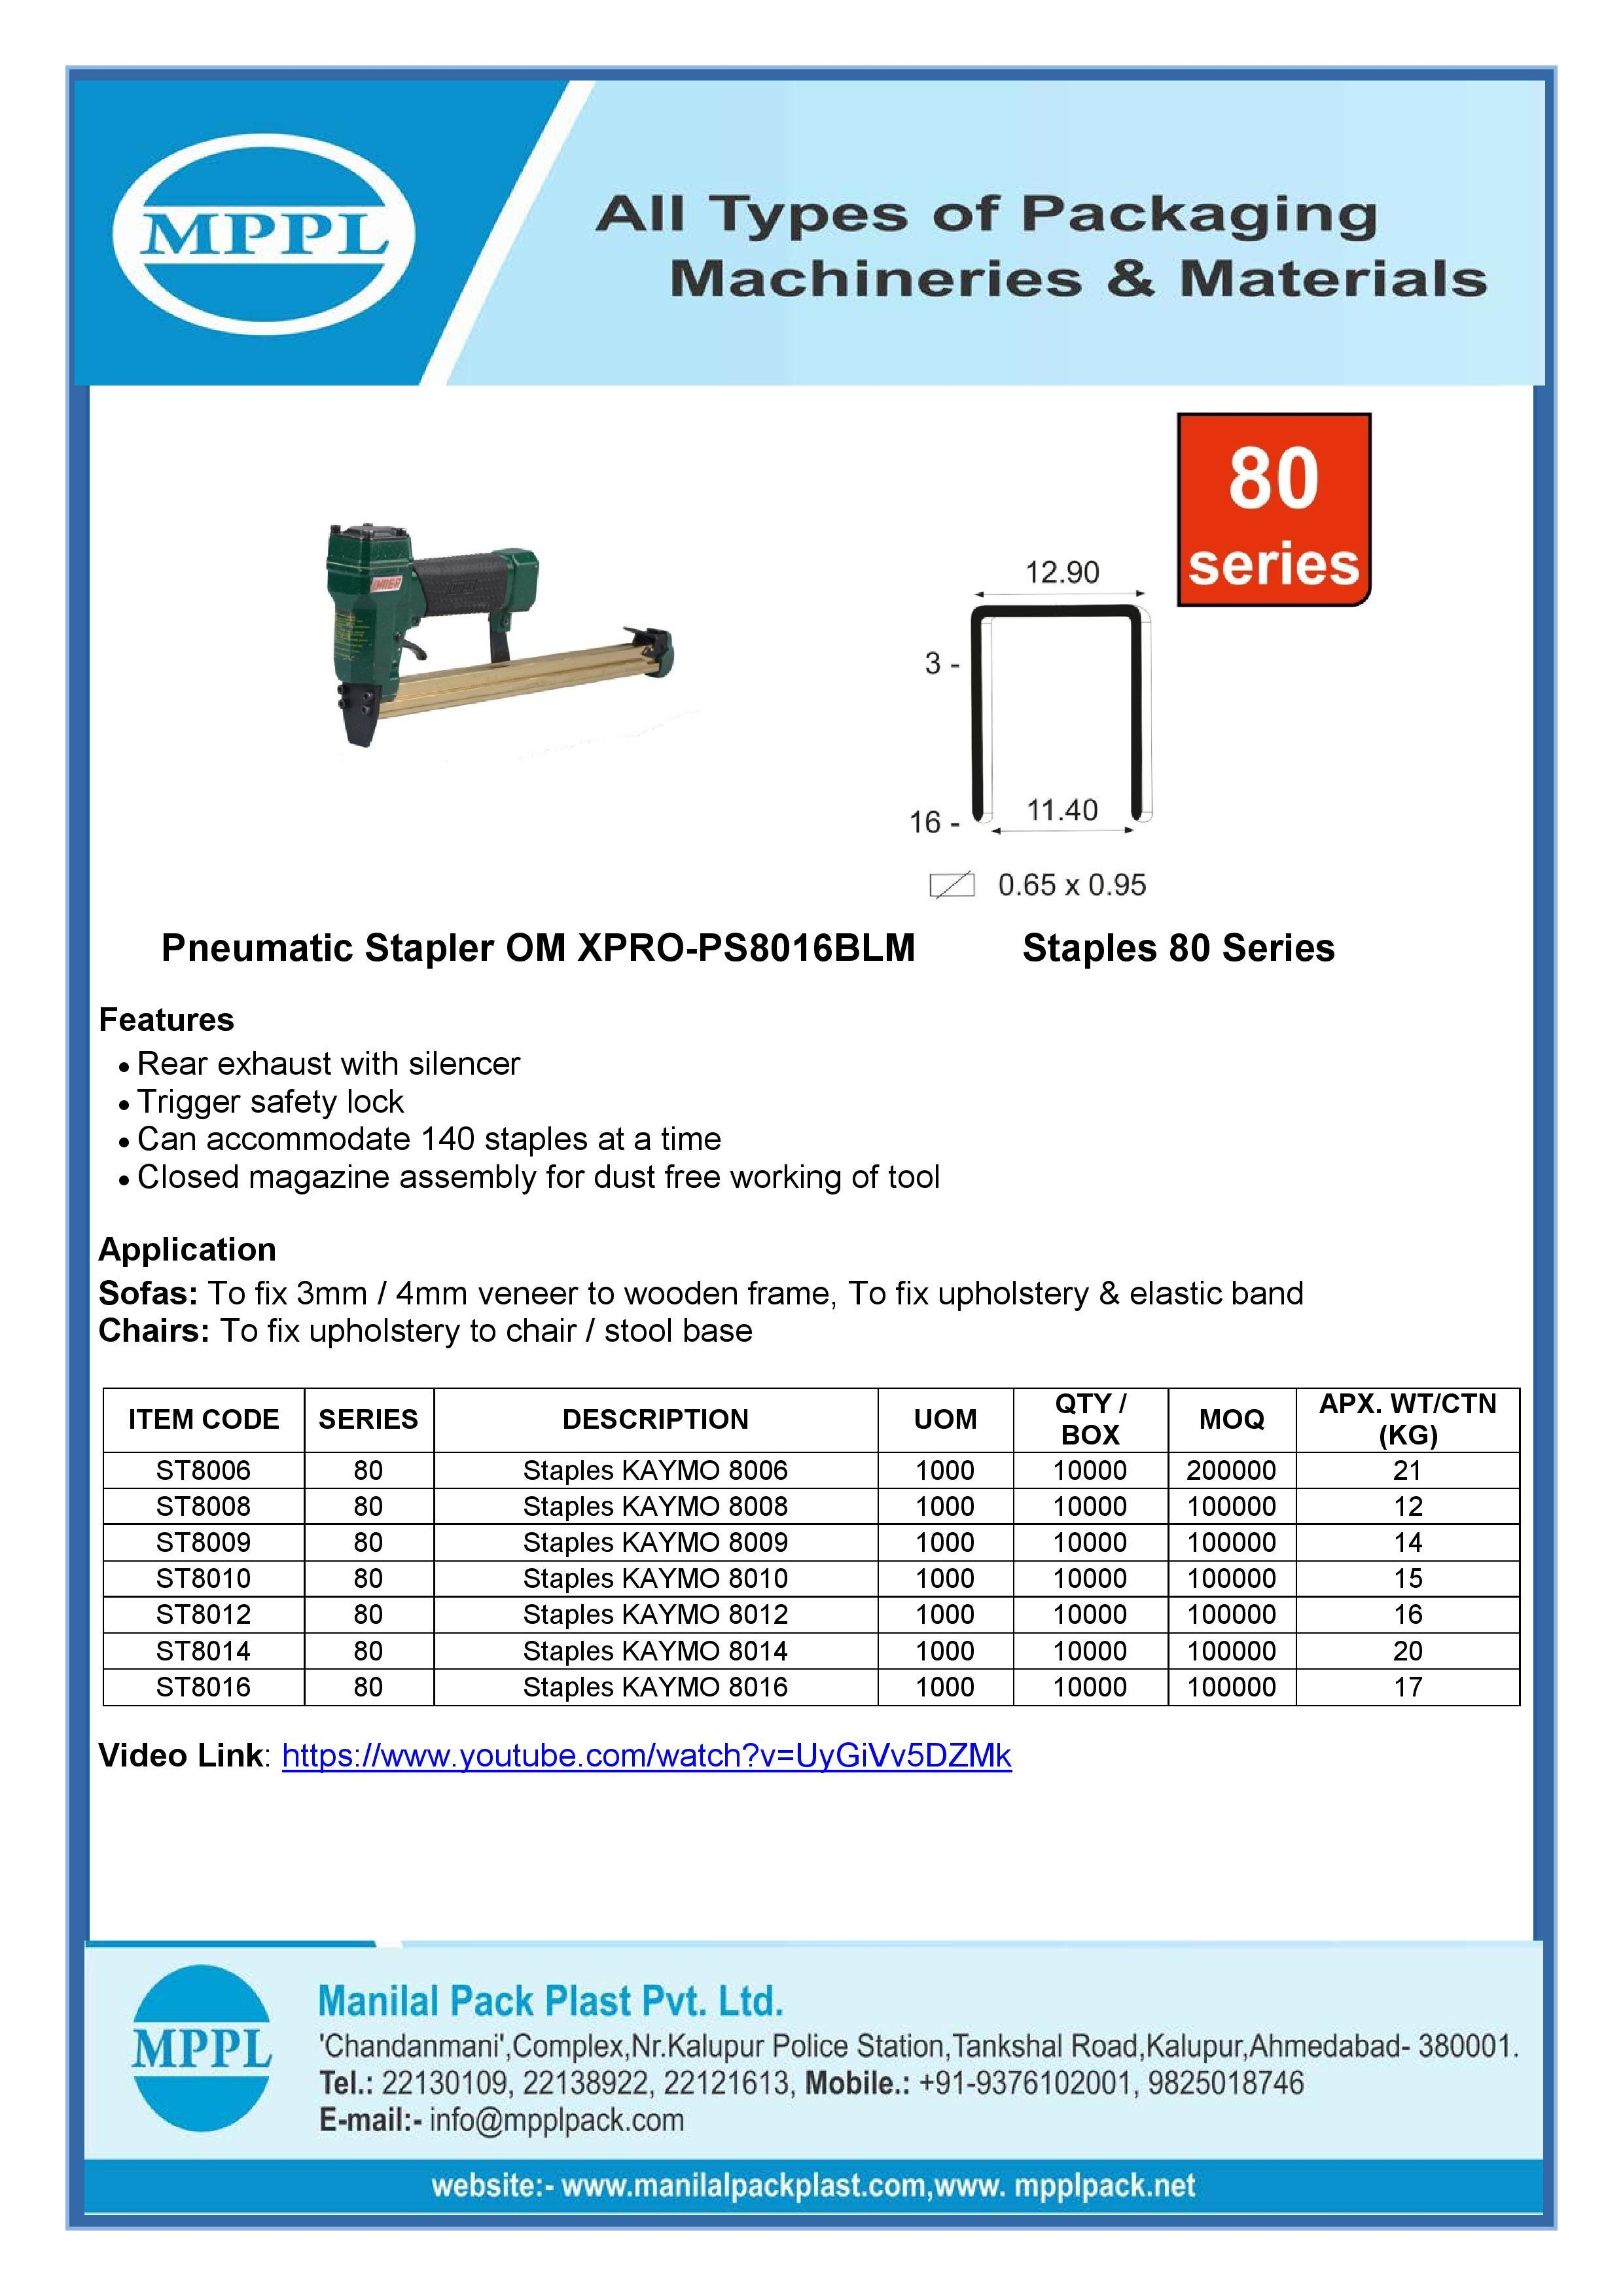 Pneumatic Stapler OM XPRO-PS8016BLM